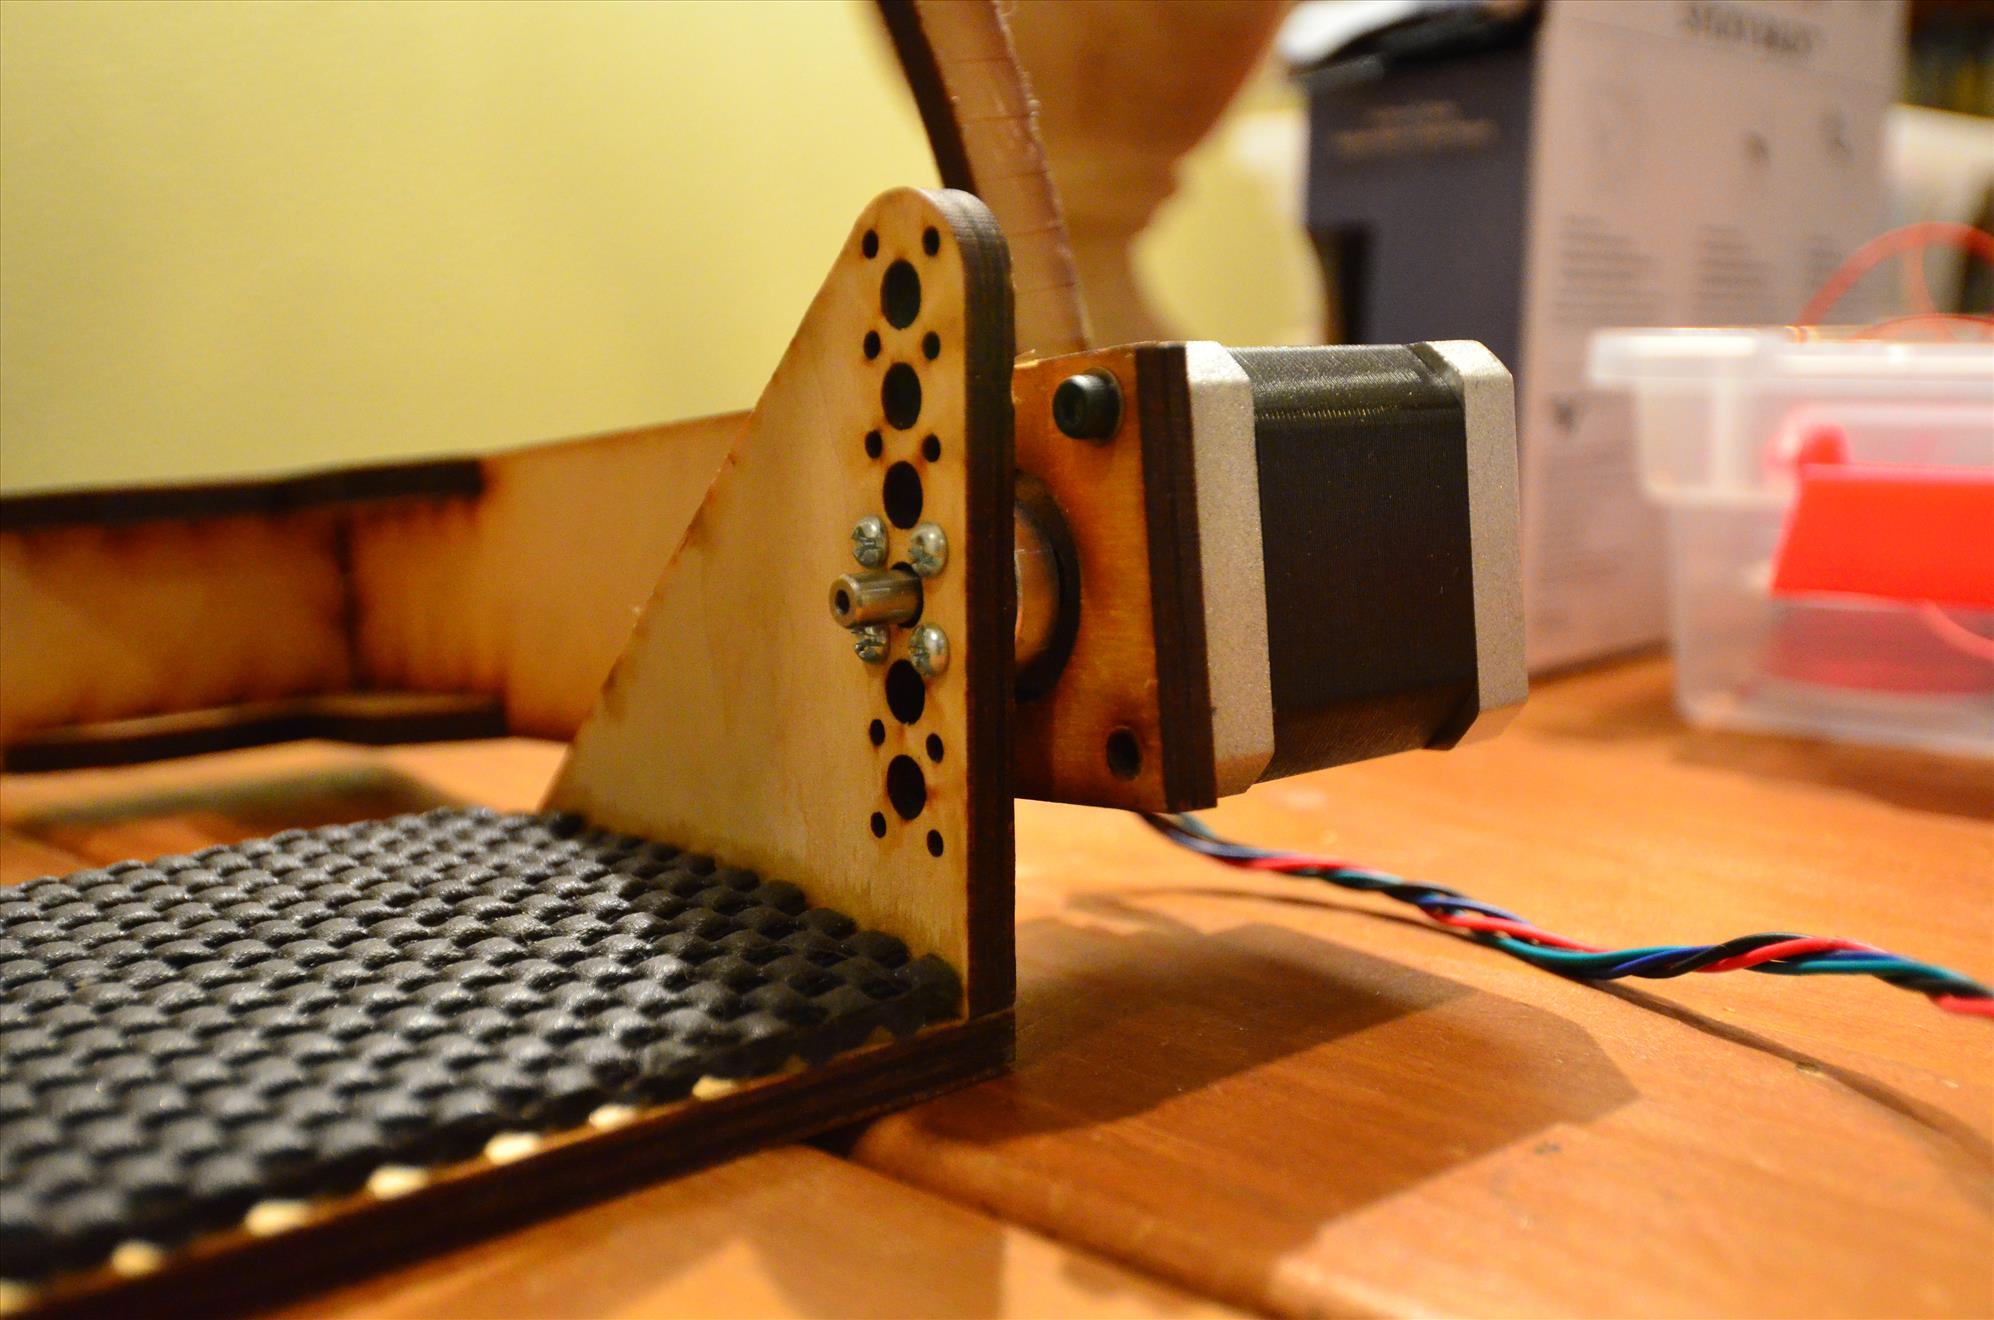 Pitch motor mount and camera platform